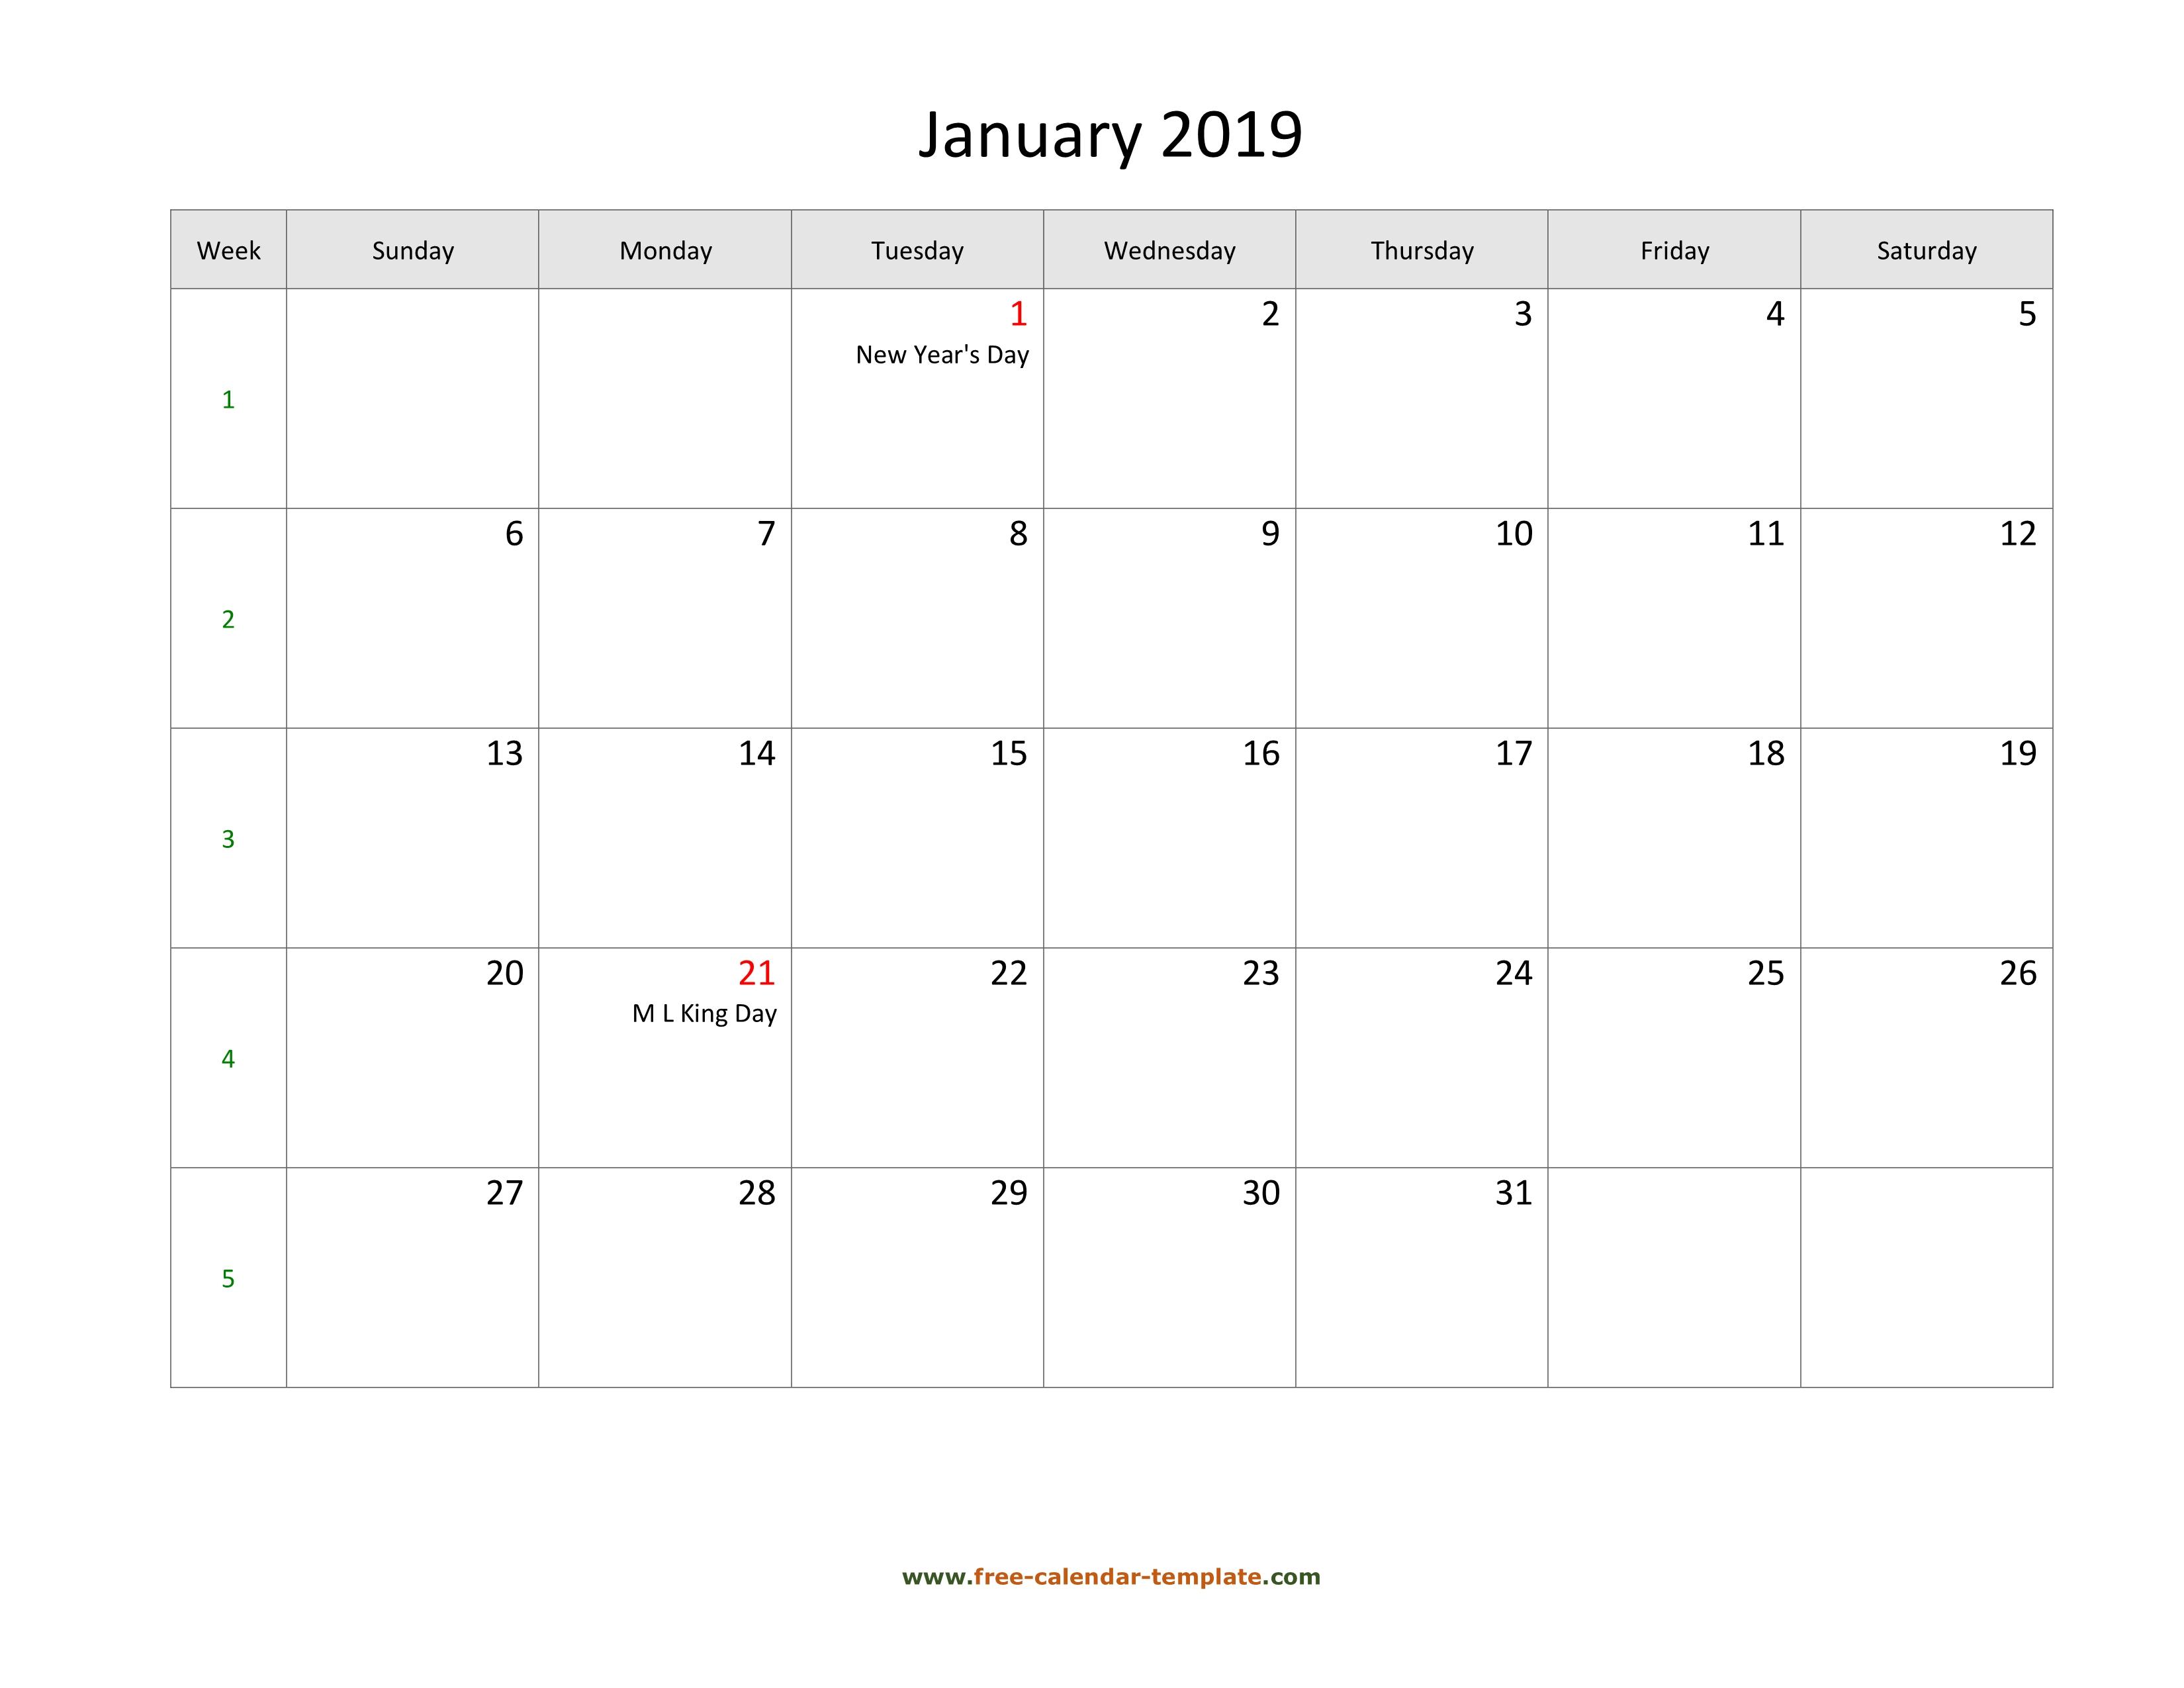 Free 2019 Calendar Blank January Template (Horizontal